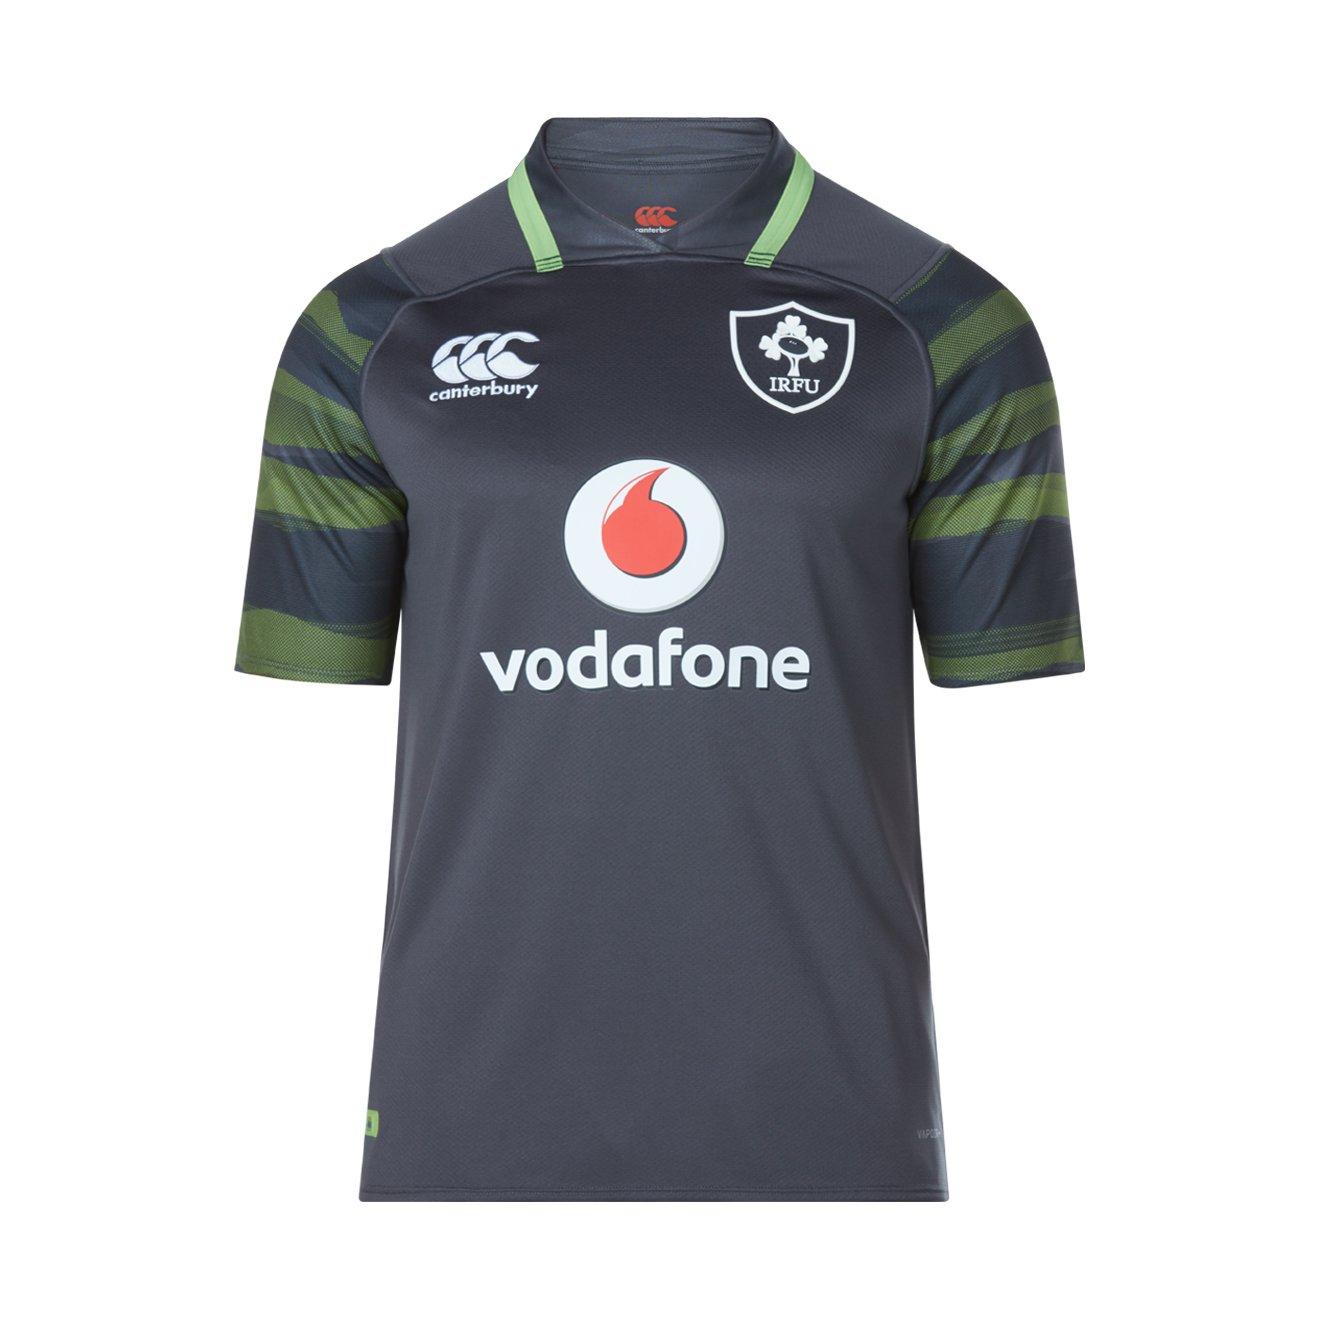 2017-2018 Ireland Vapordri Alternate Pro Rugby Shirt Canterbury